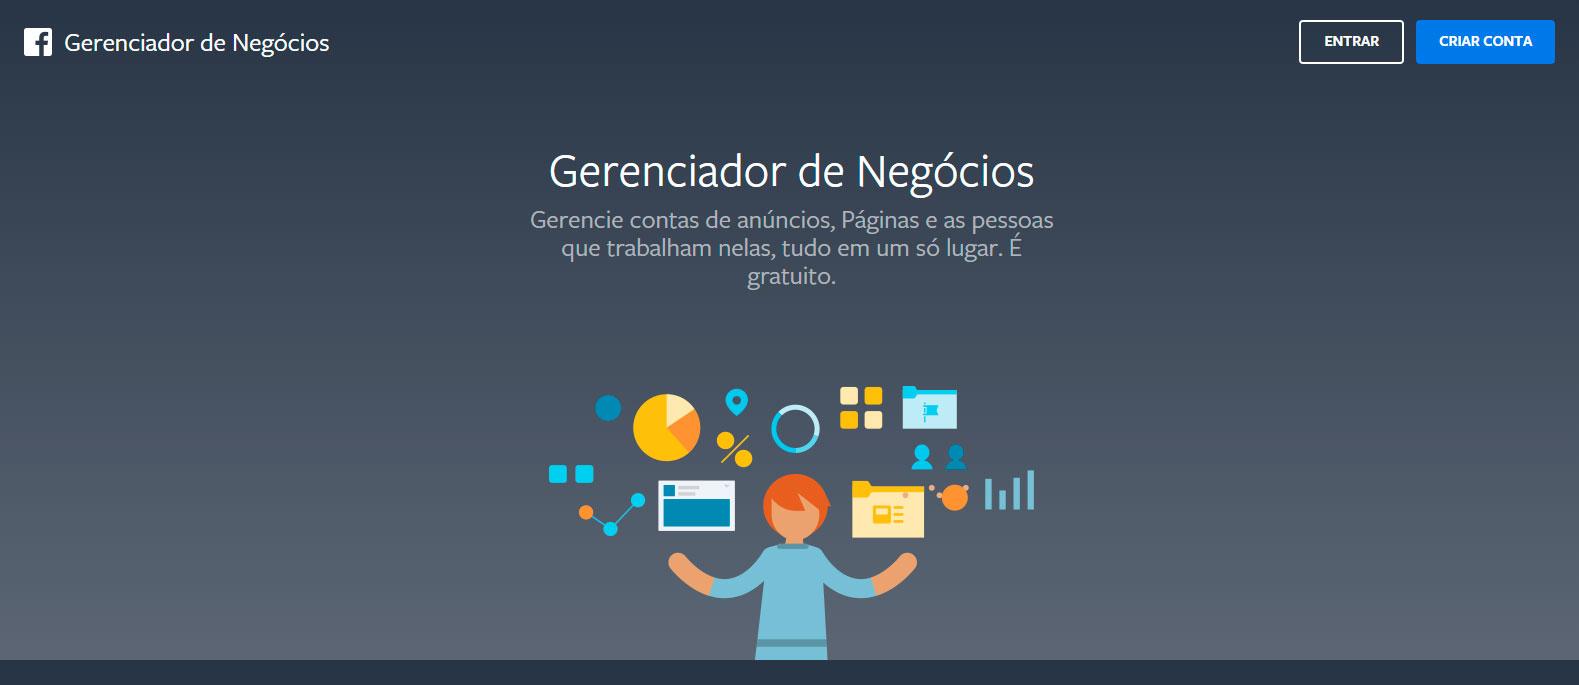 Facebook Business - Gerenciador de Negócios do Facebook